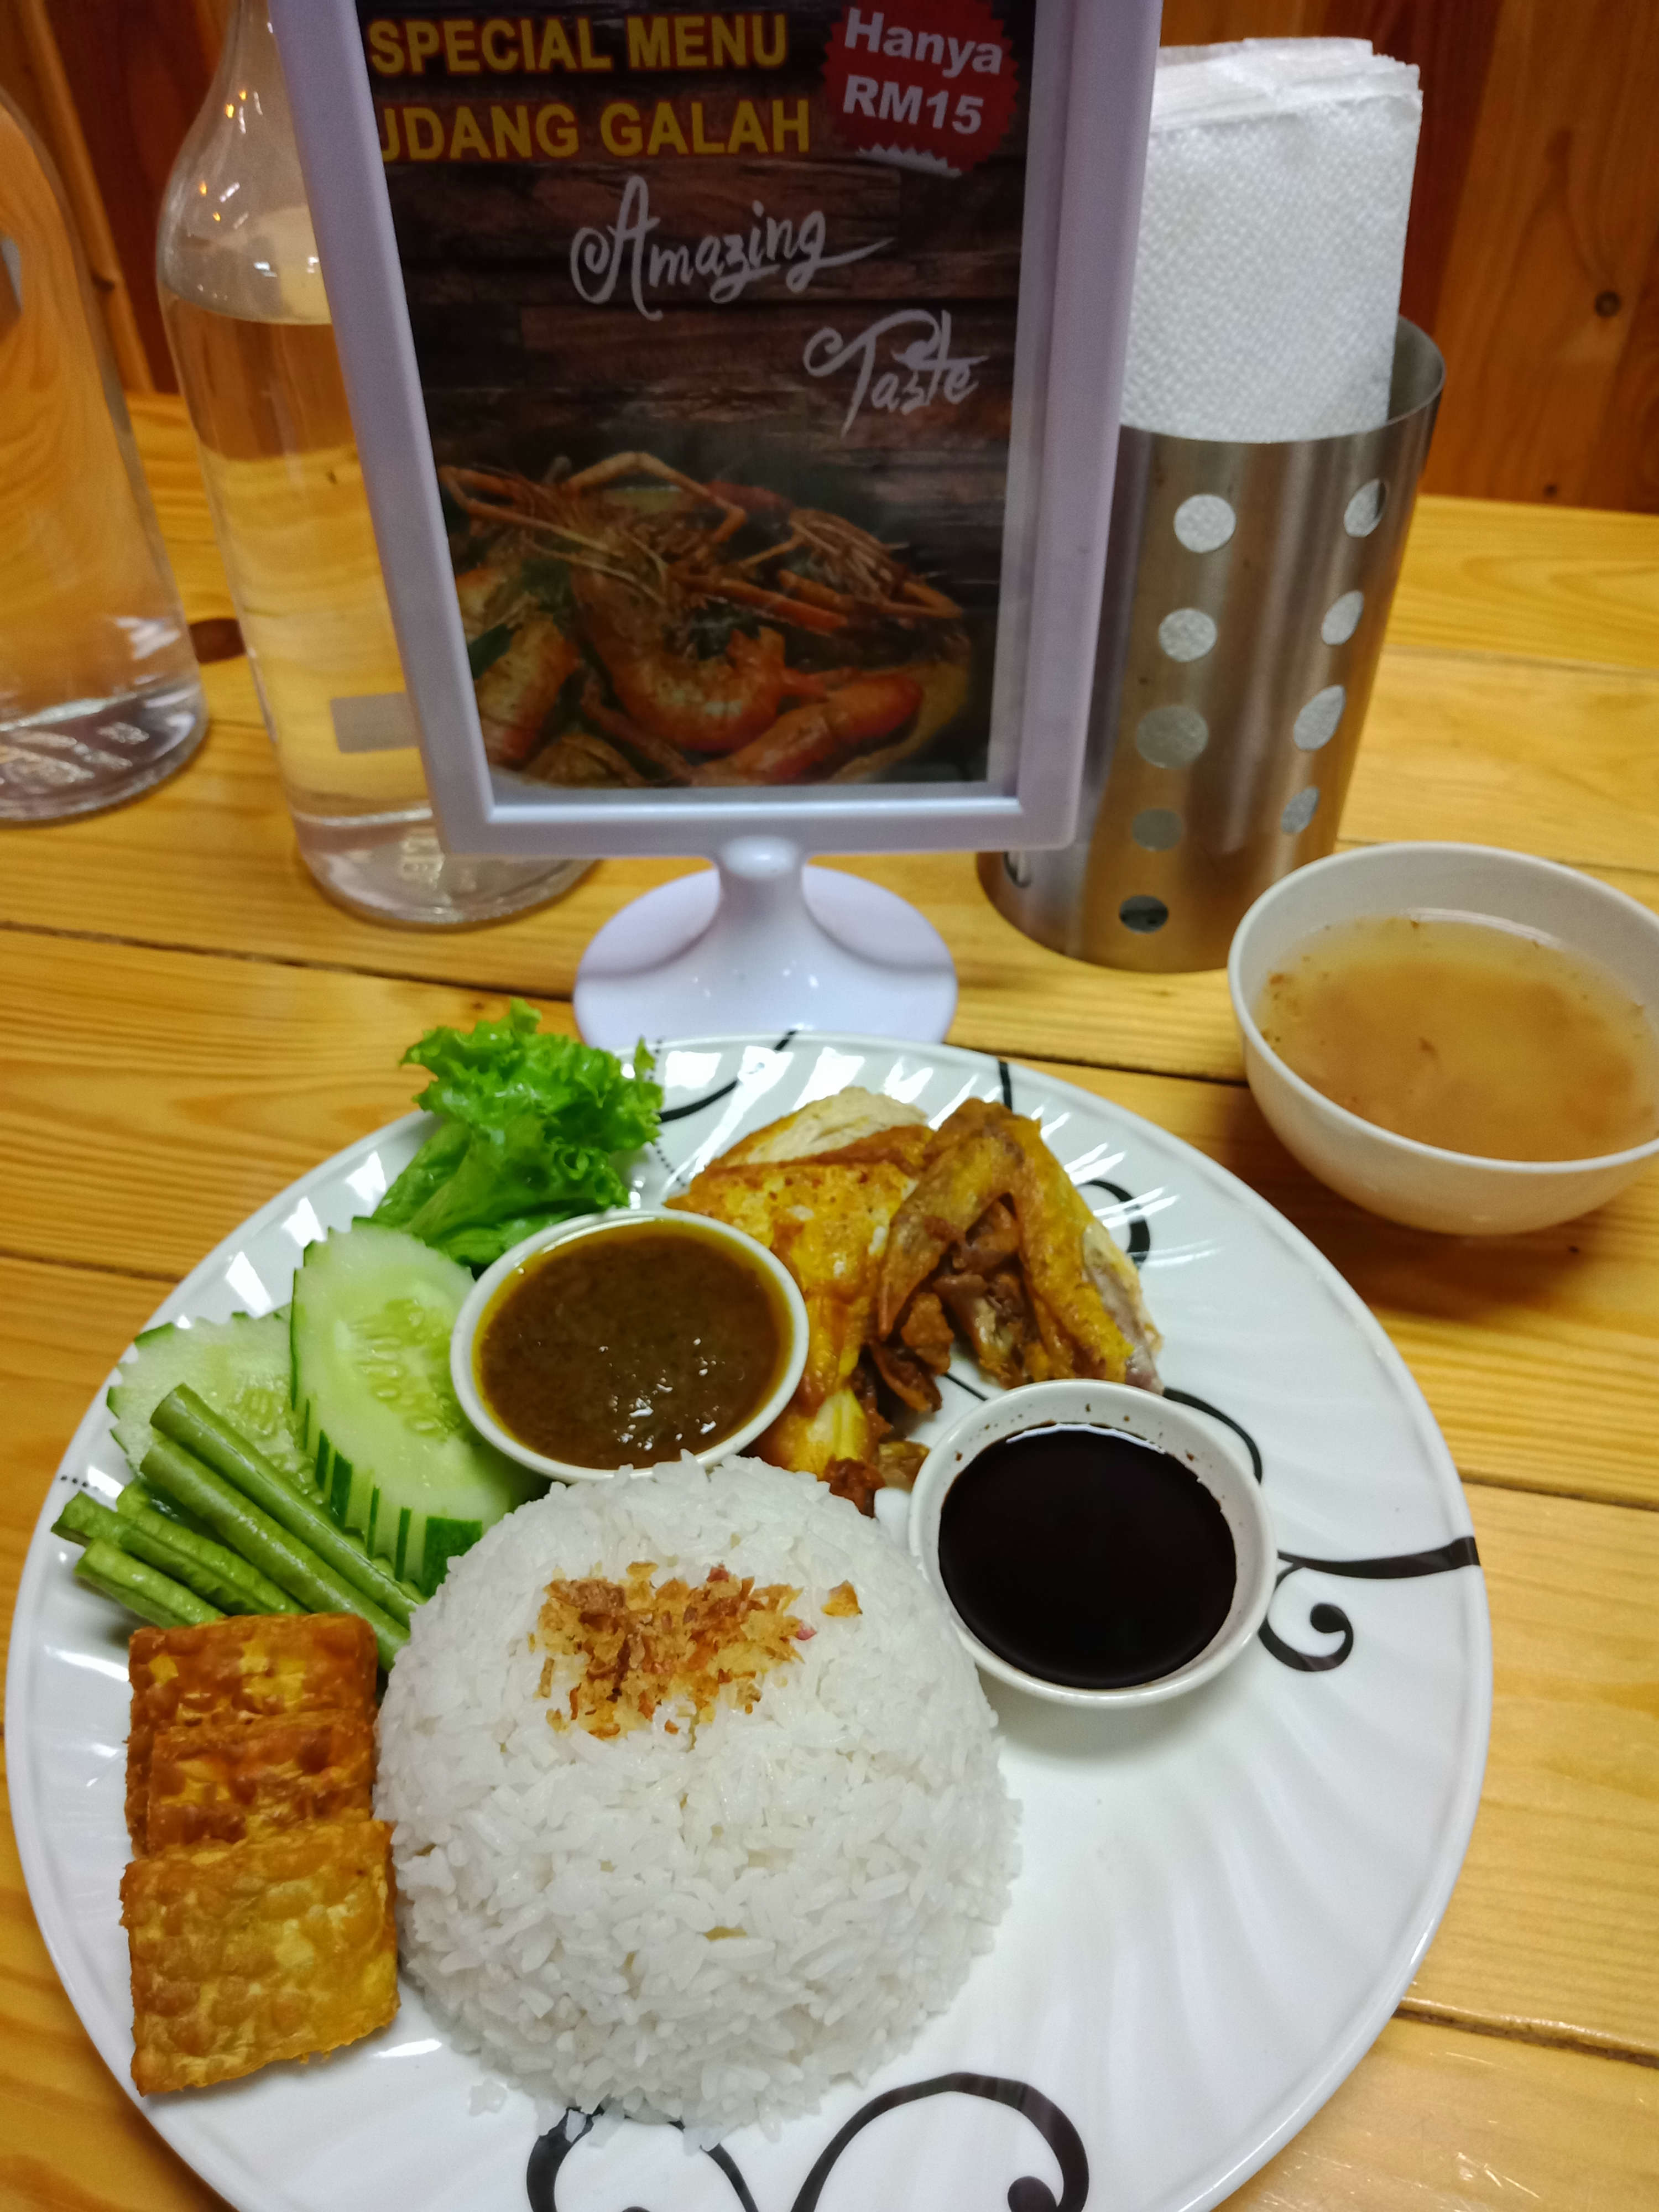 Ayam Penyet - RM9.90